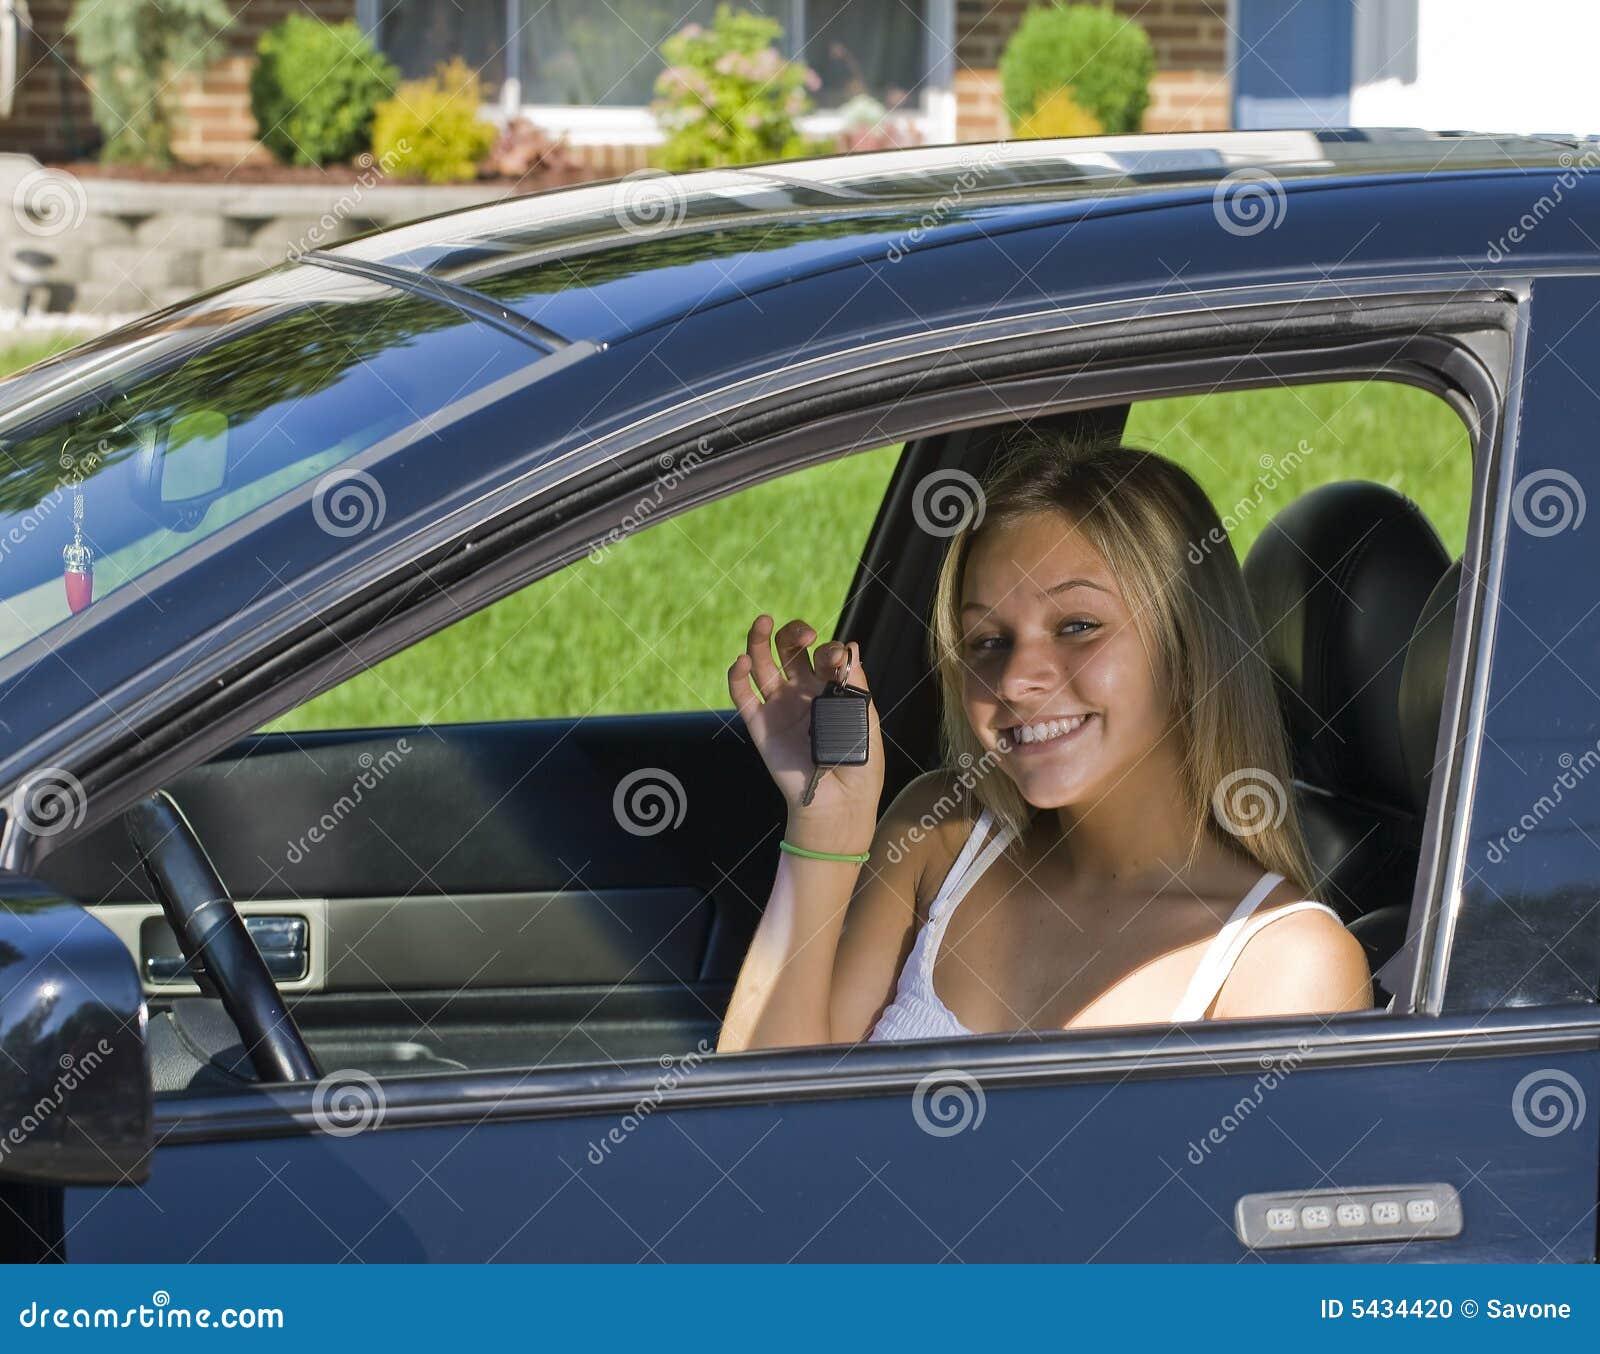 Drivers Permit Stock Photo Image 5434420